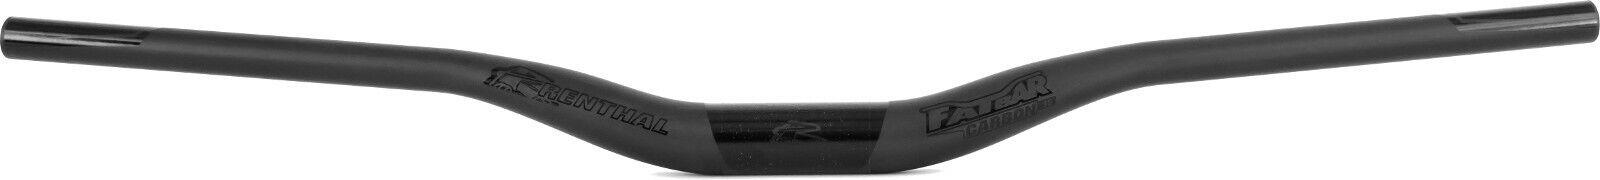 Renthal Fatbar 30mm Rise 35x800mm Carbon Stealth Ltd Ed MTB Handlebars